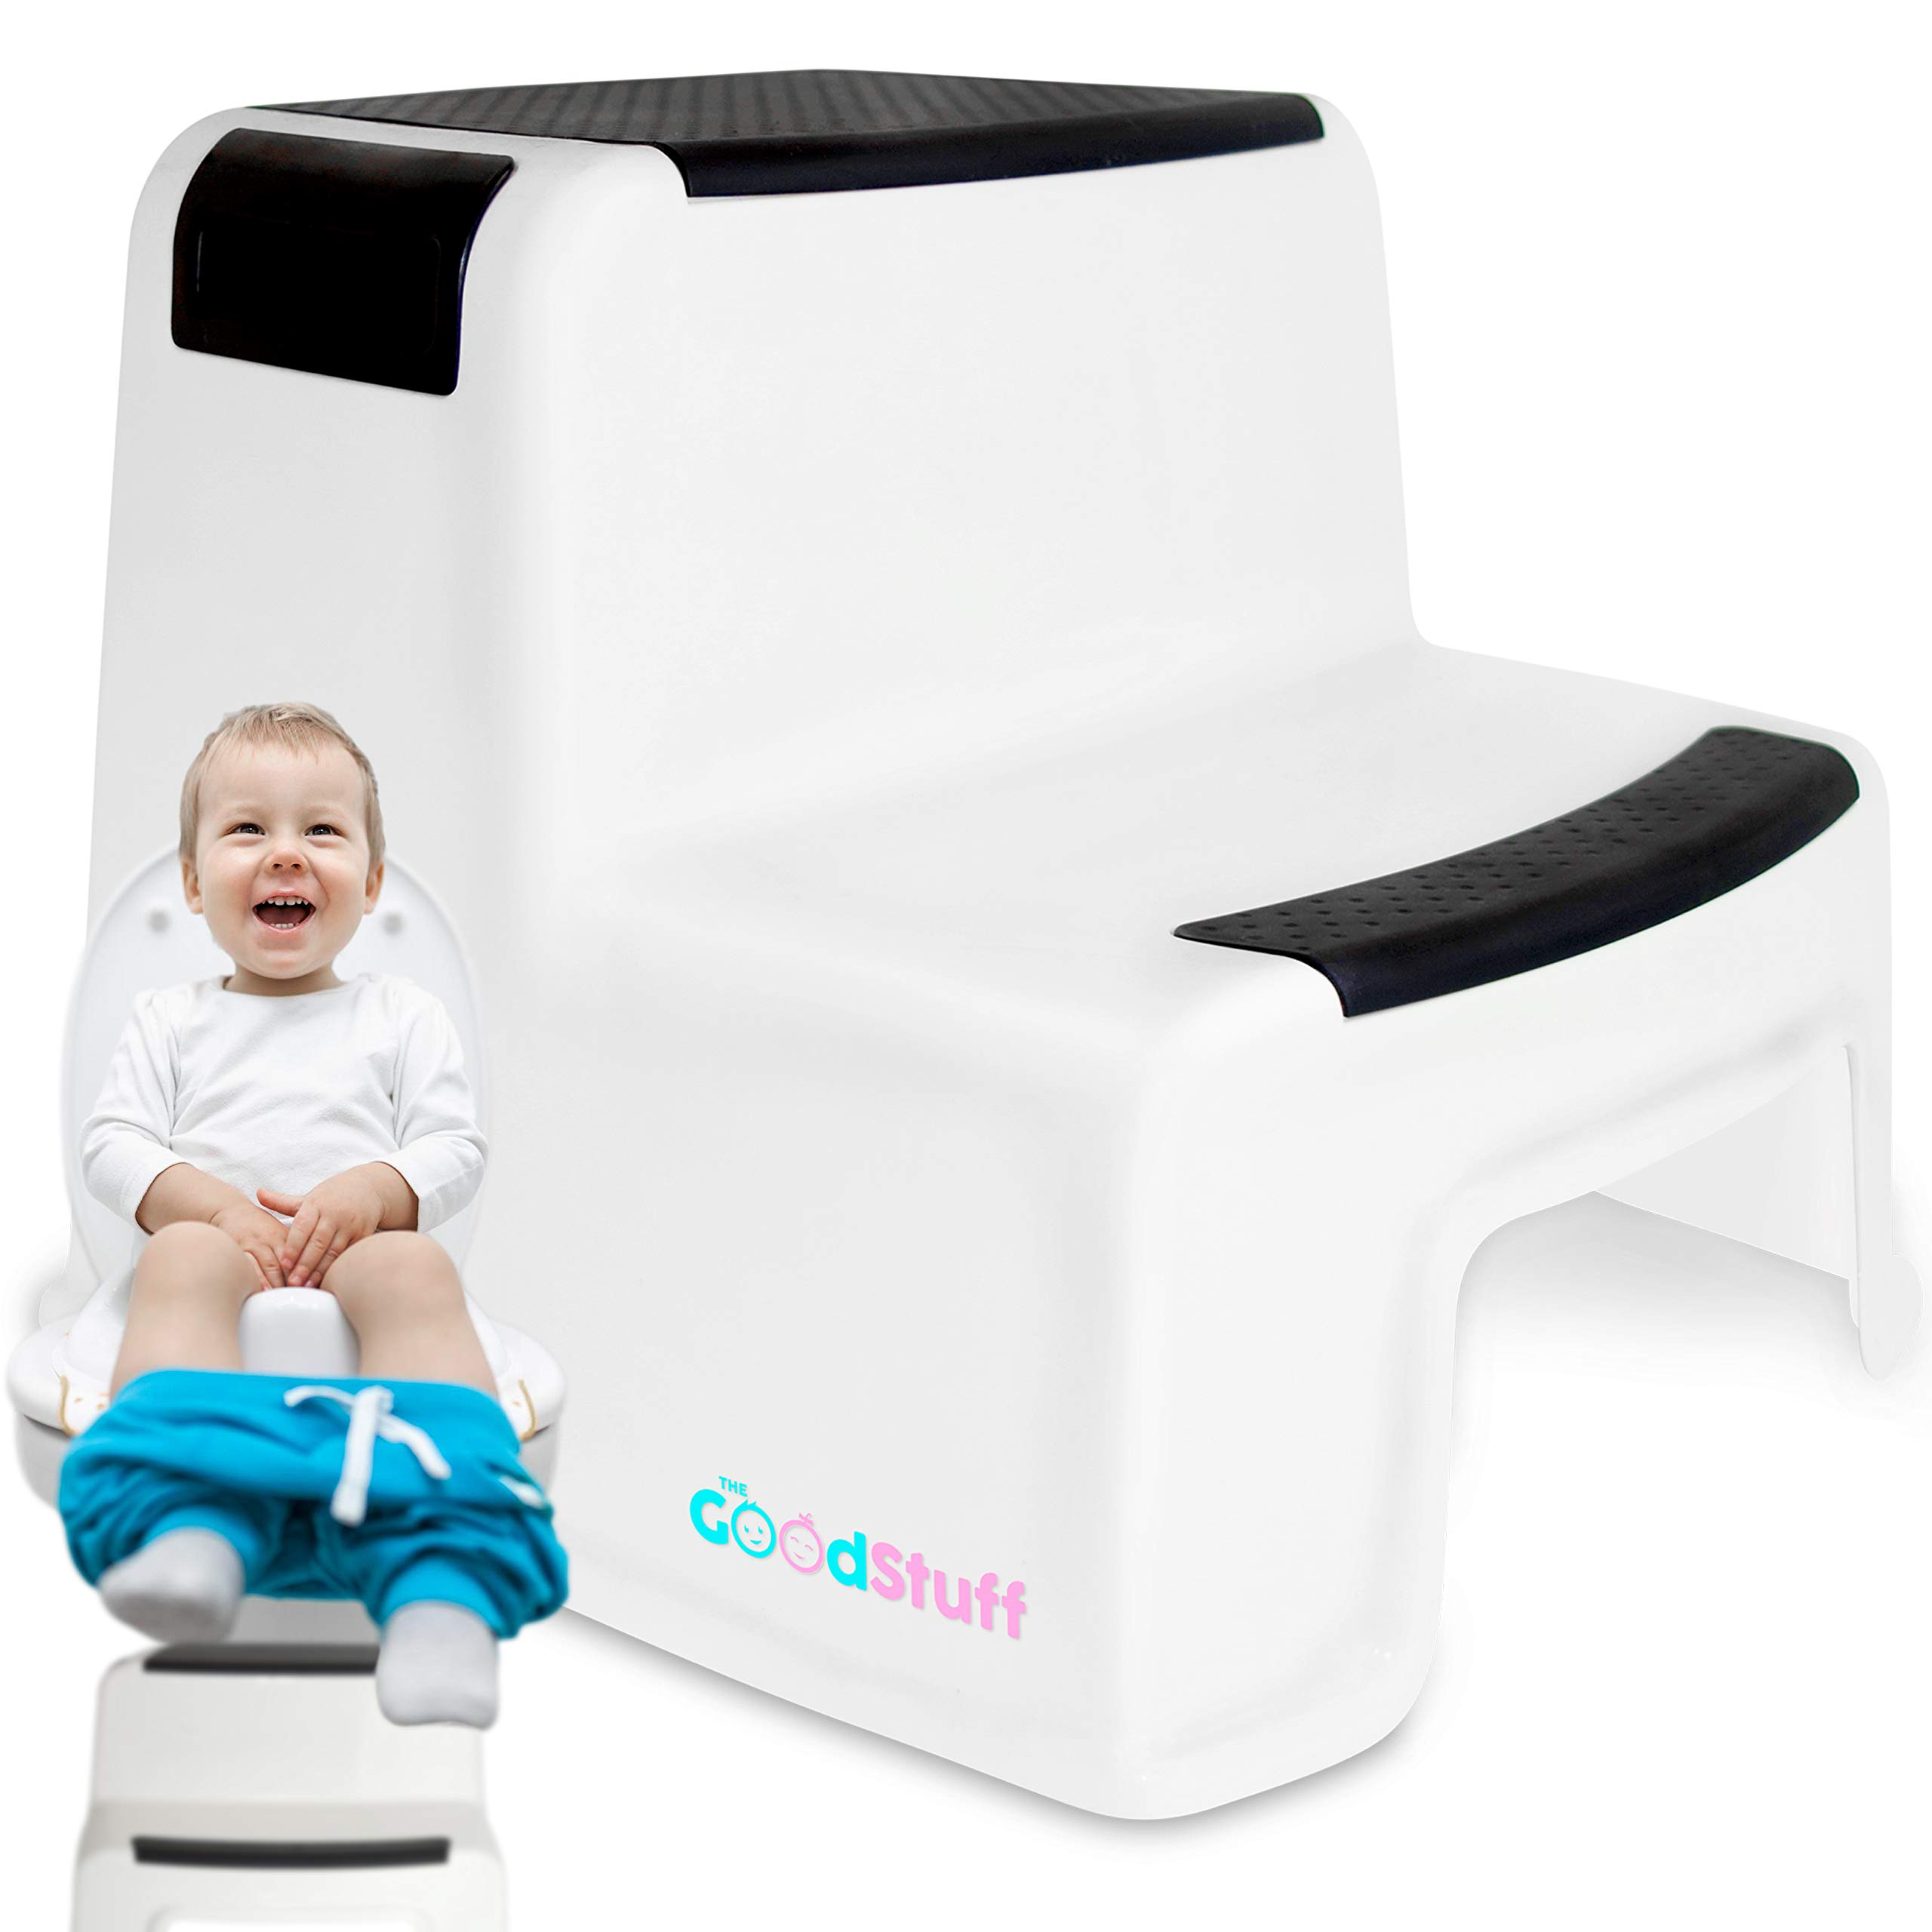 Toddler Step Stool for Kids - Potty Training Step Stool Bathroom ...